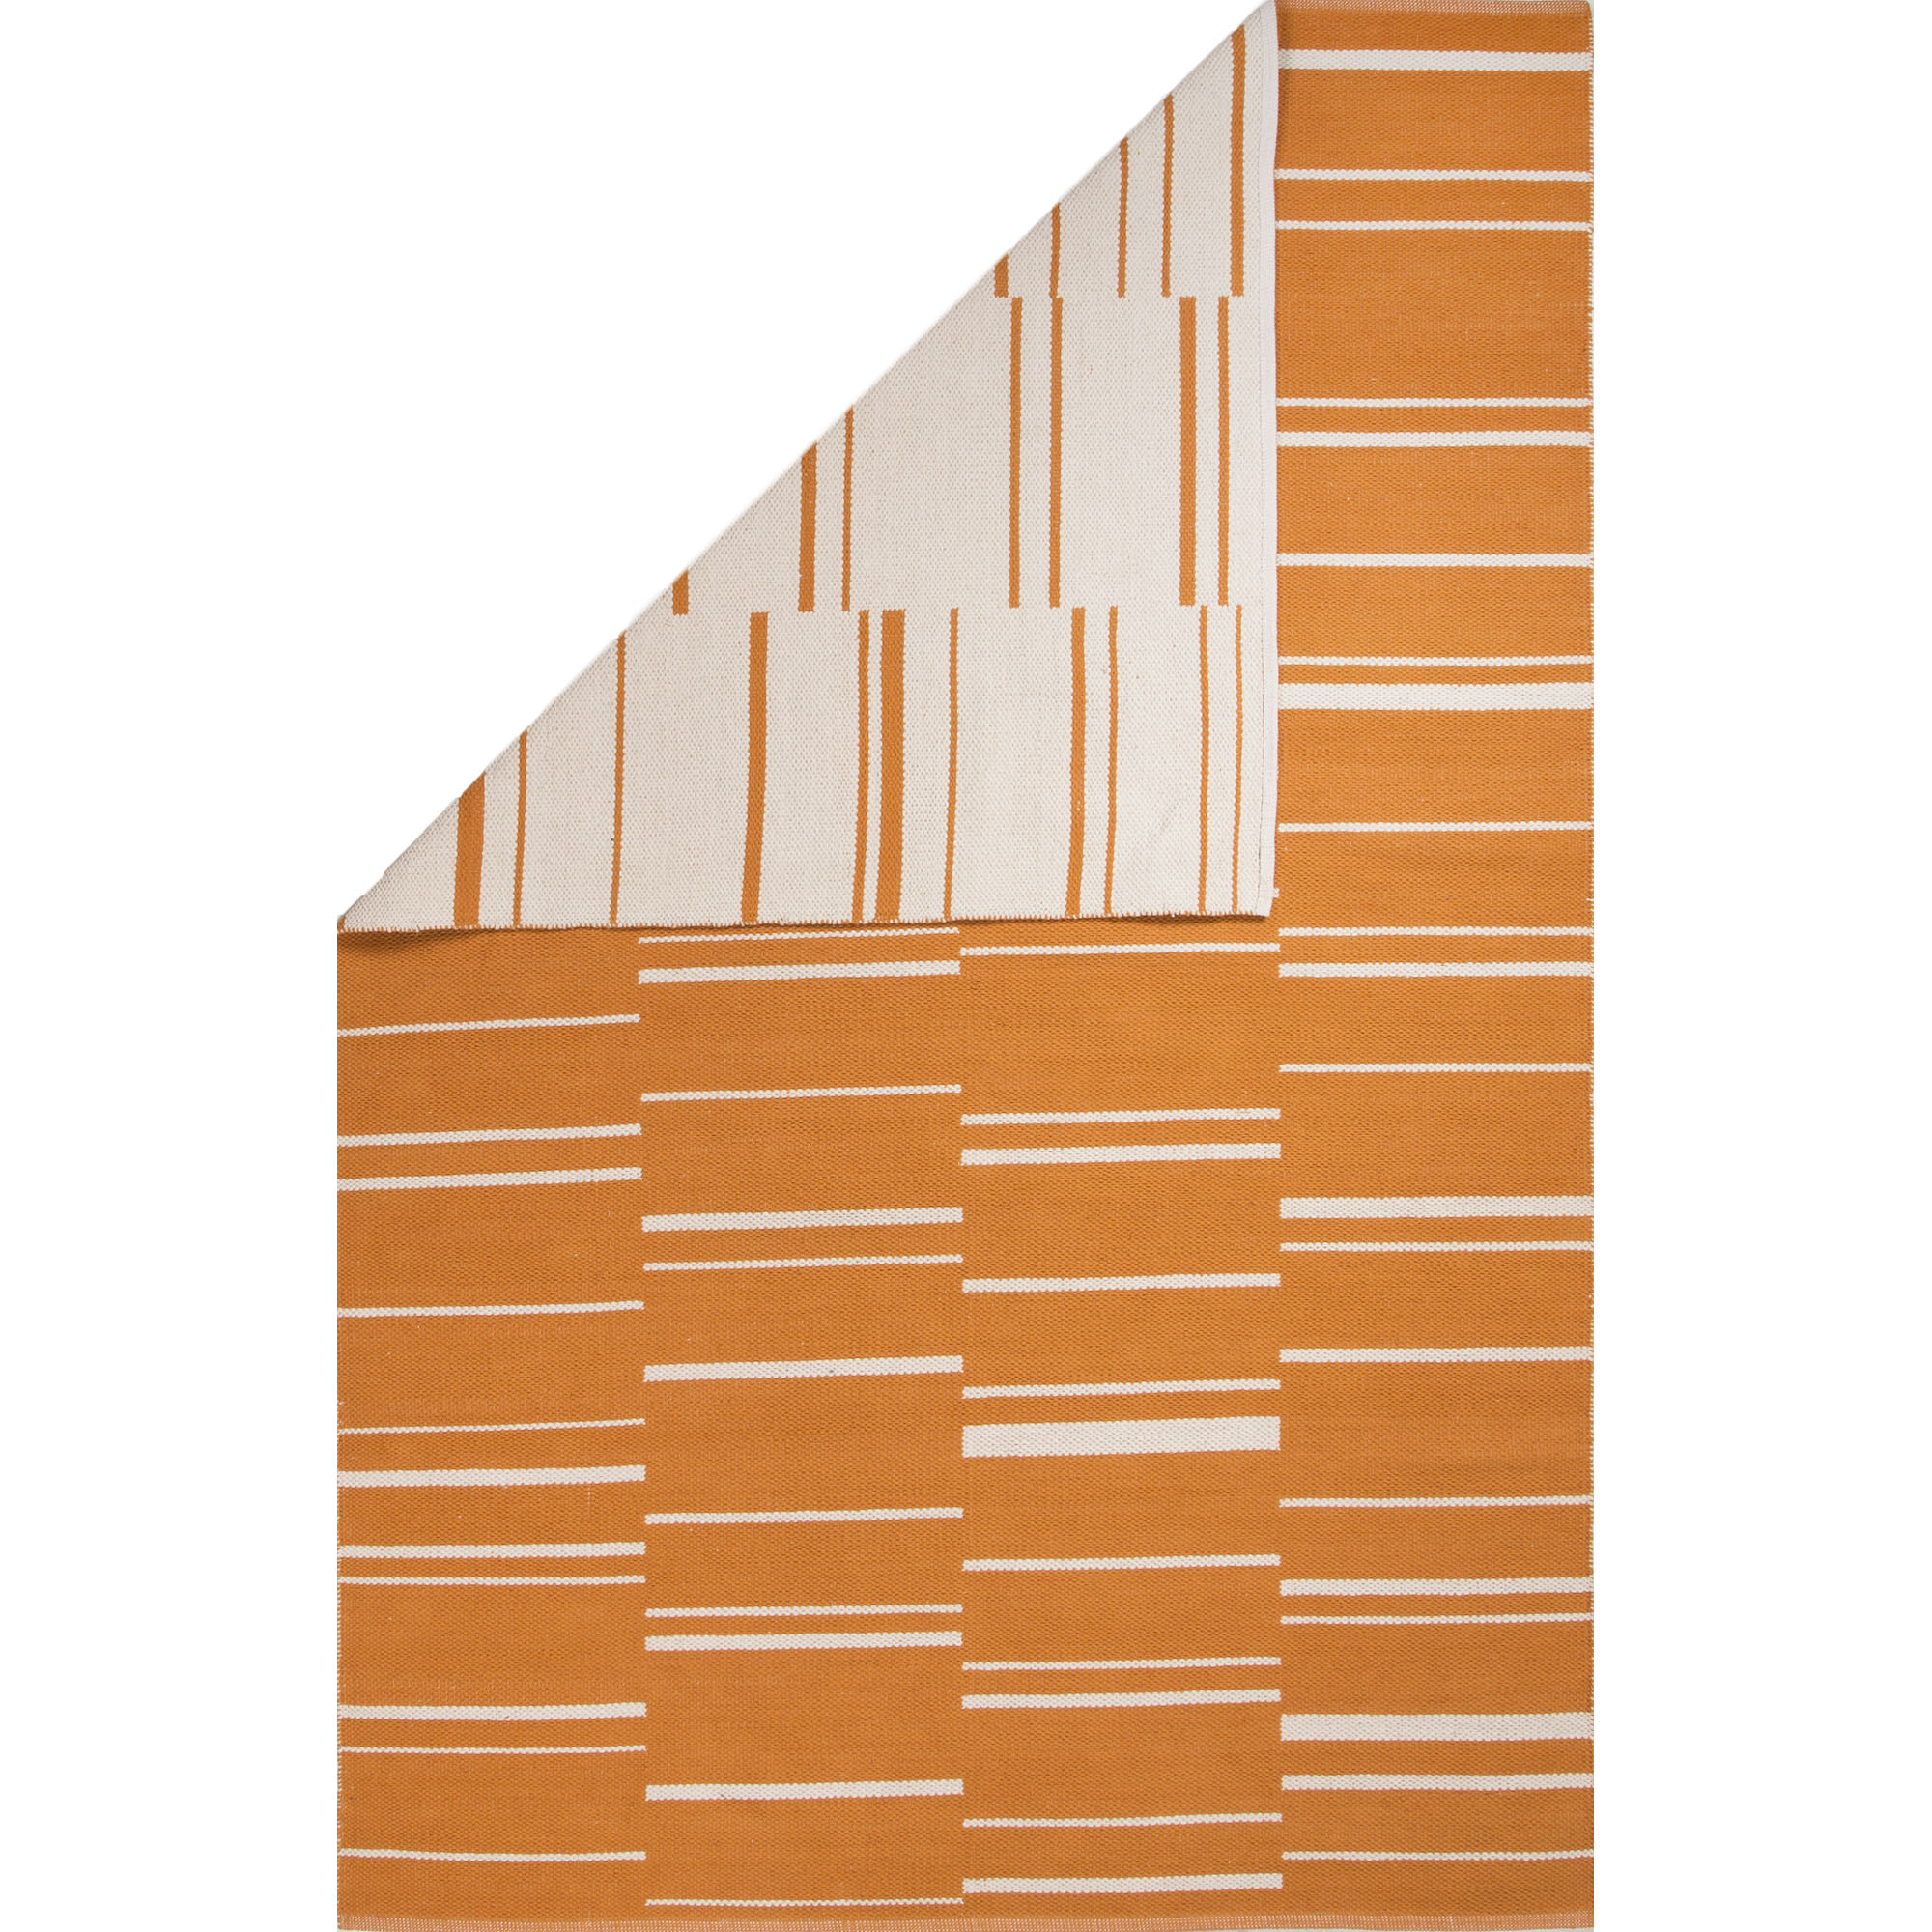 JAIPUR Rugs Sonoma 8 x 11 Rug - Item Number: RUG123847